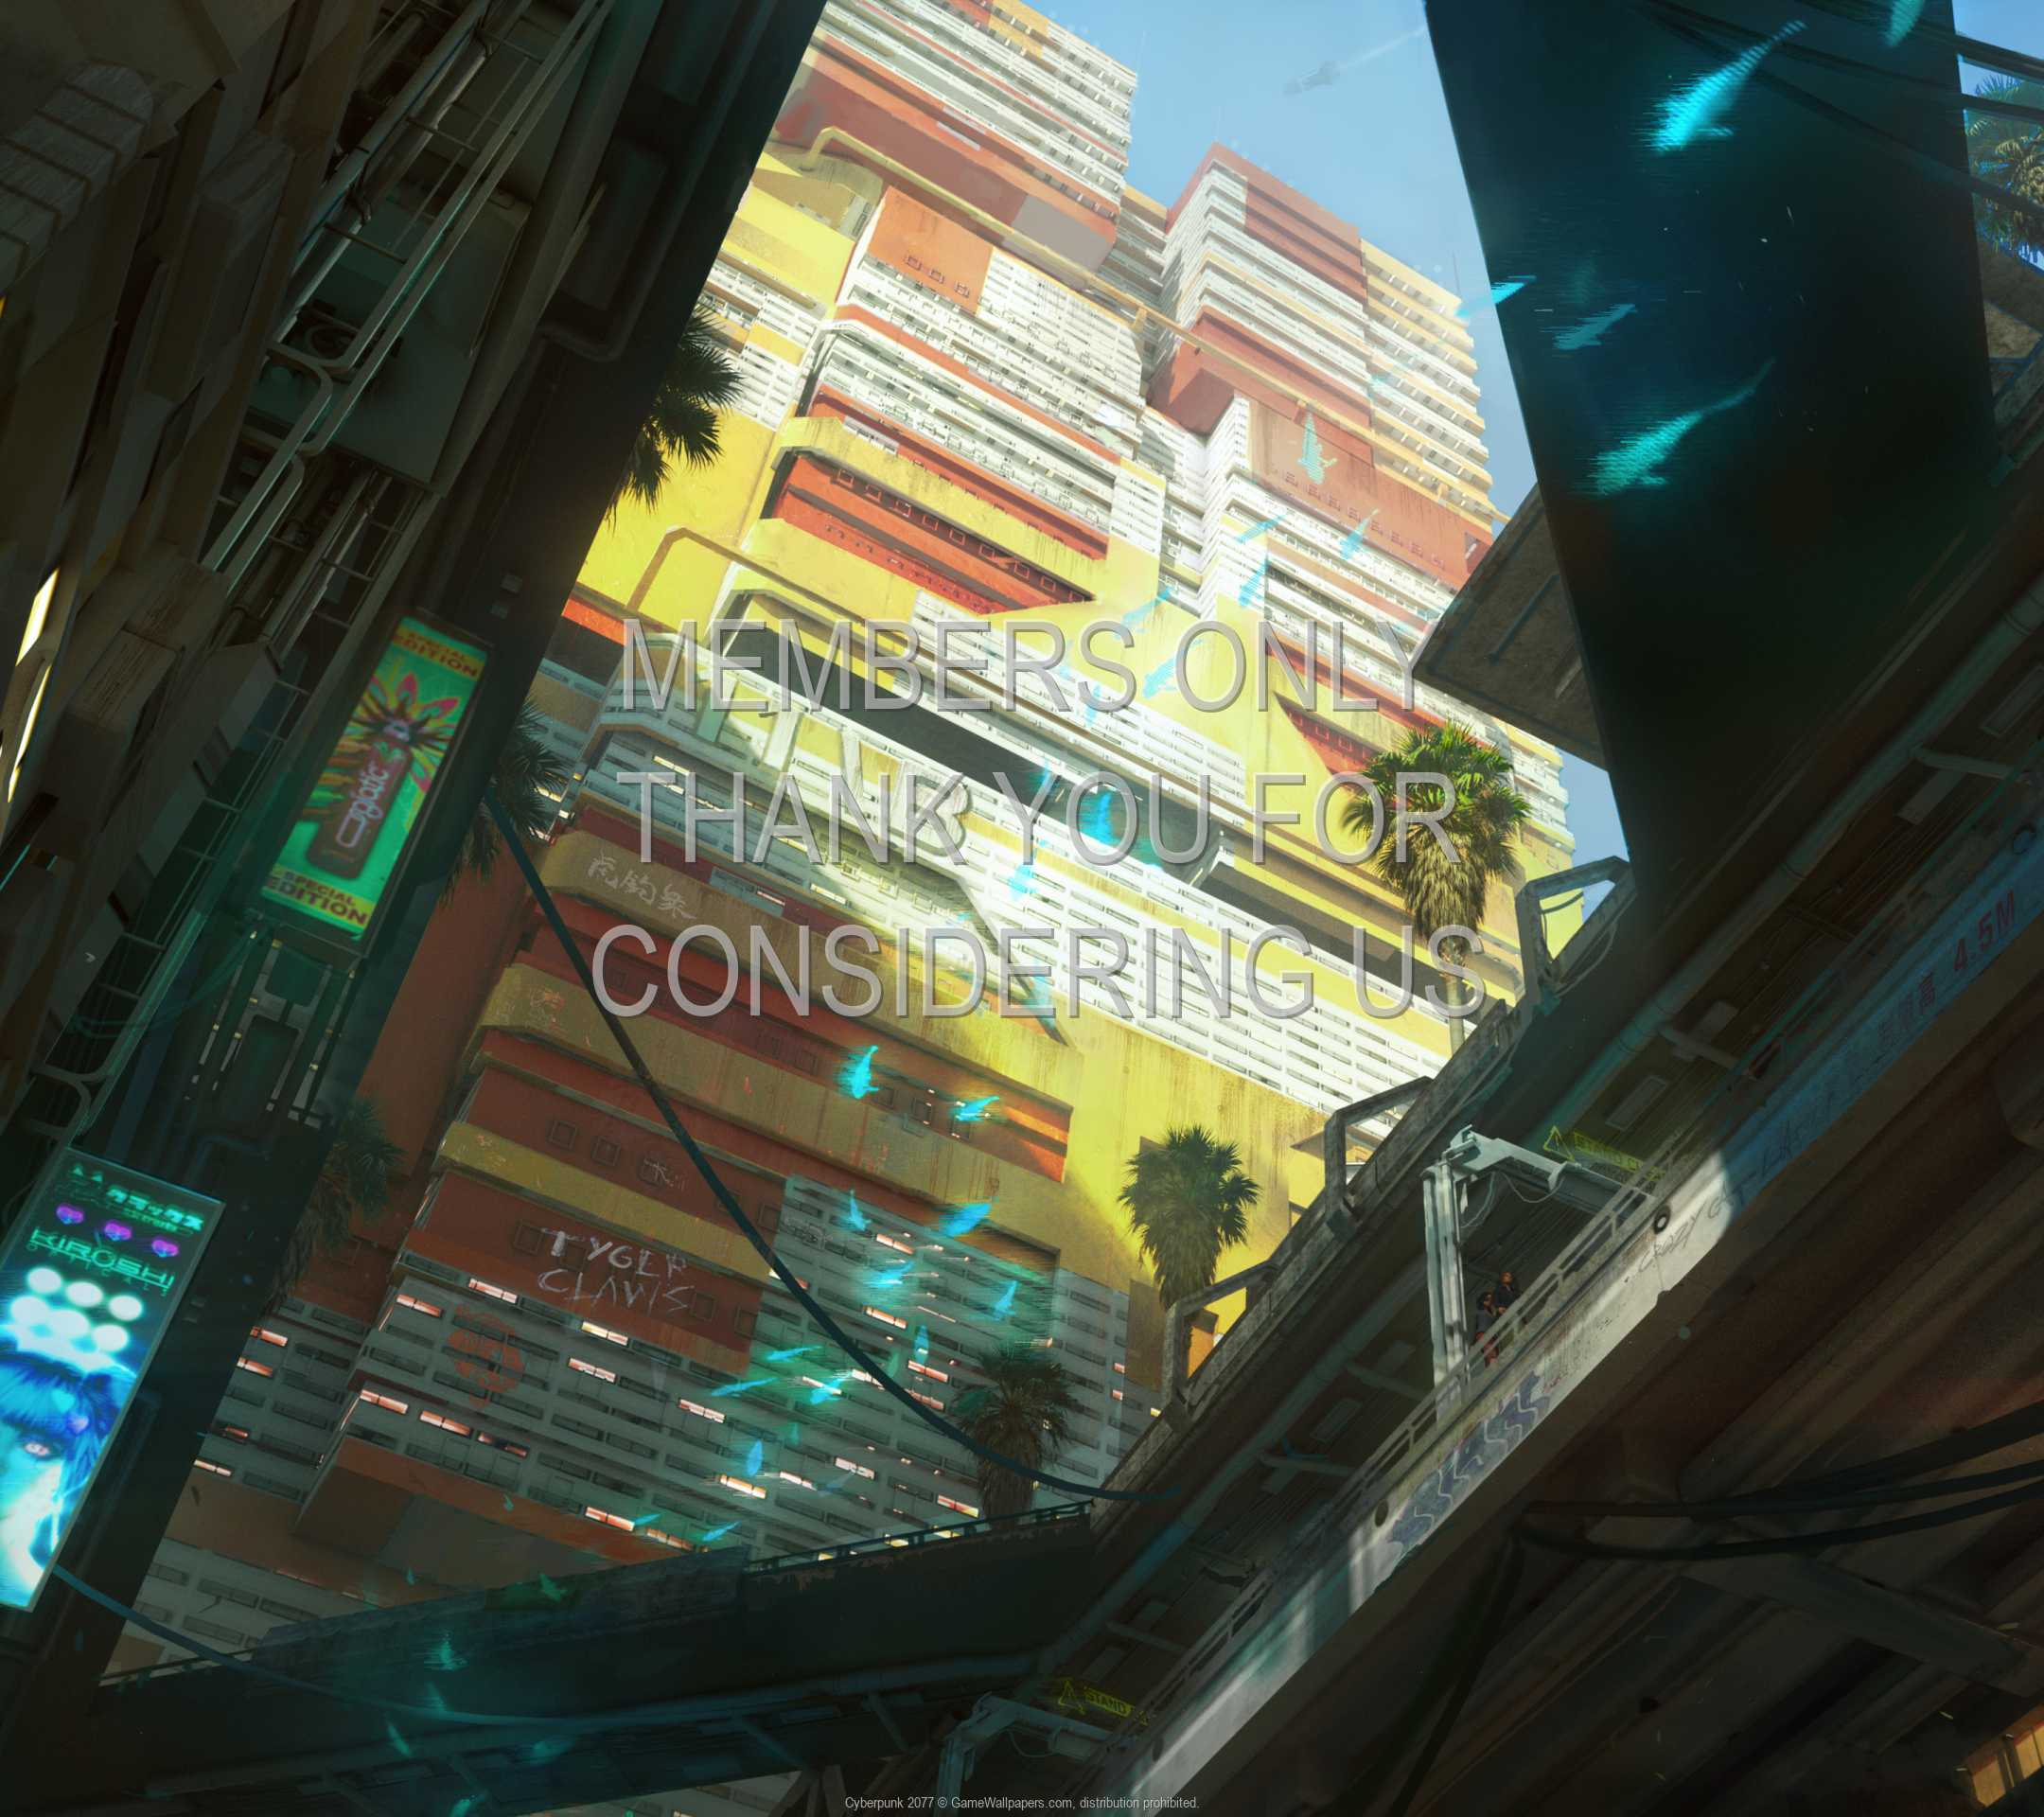 Cyberpunk 2077 1080p Horizontal Mobile wallpaper or background 34